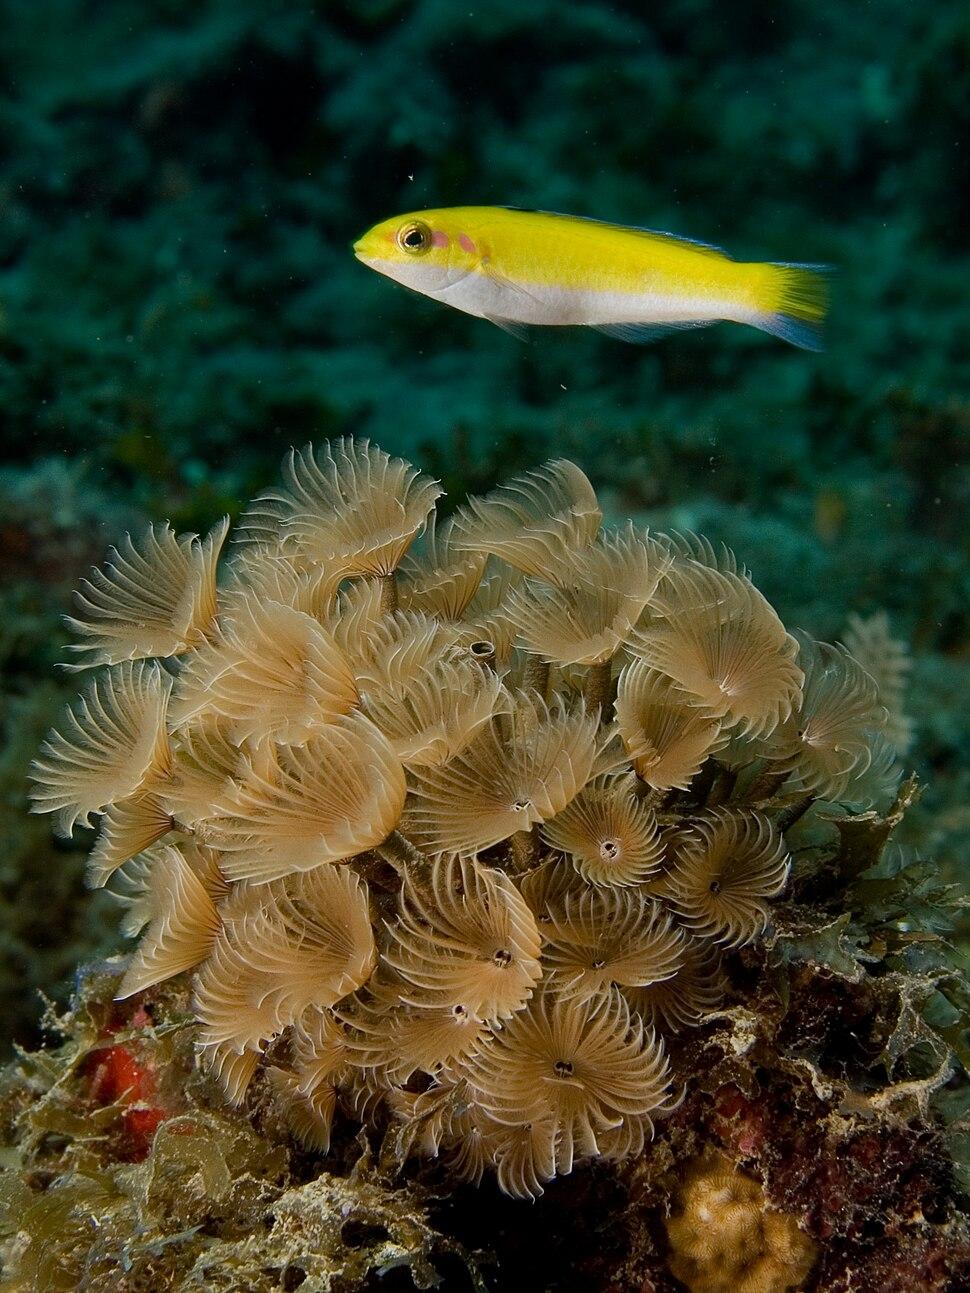 Thalassoma bifasciatum (Bluehead Wrasse) juvenile yellow stage over Bispira brunnea (Social Feather Duster Worms)